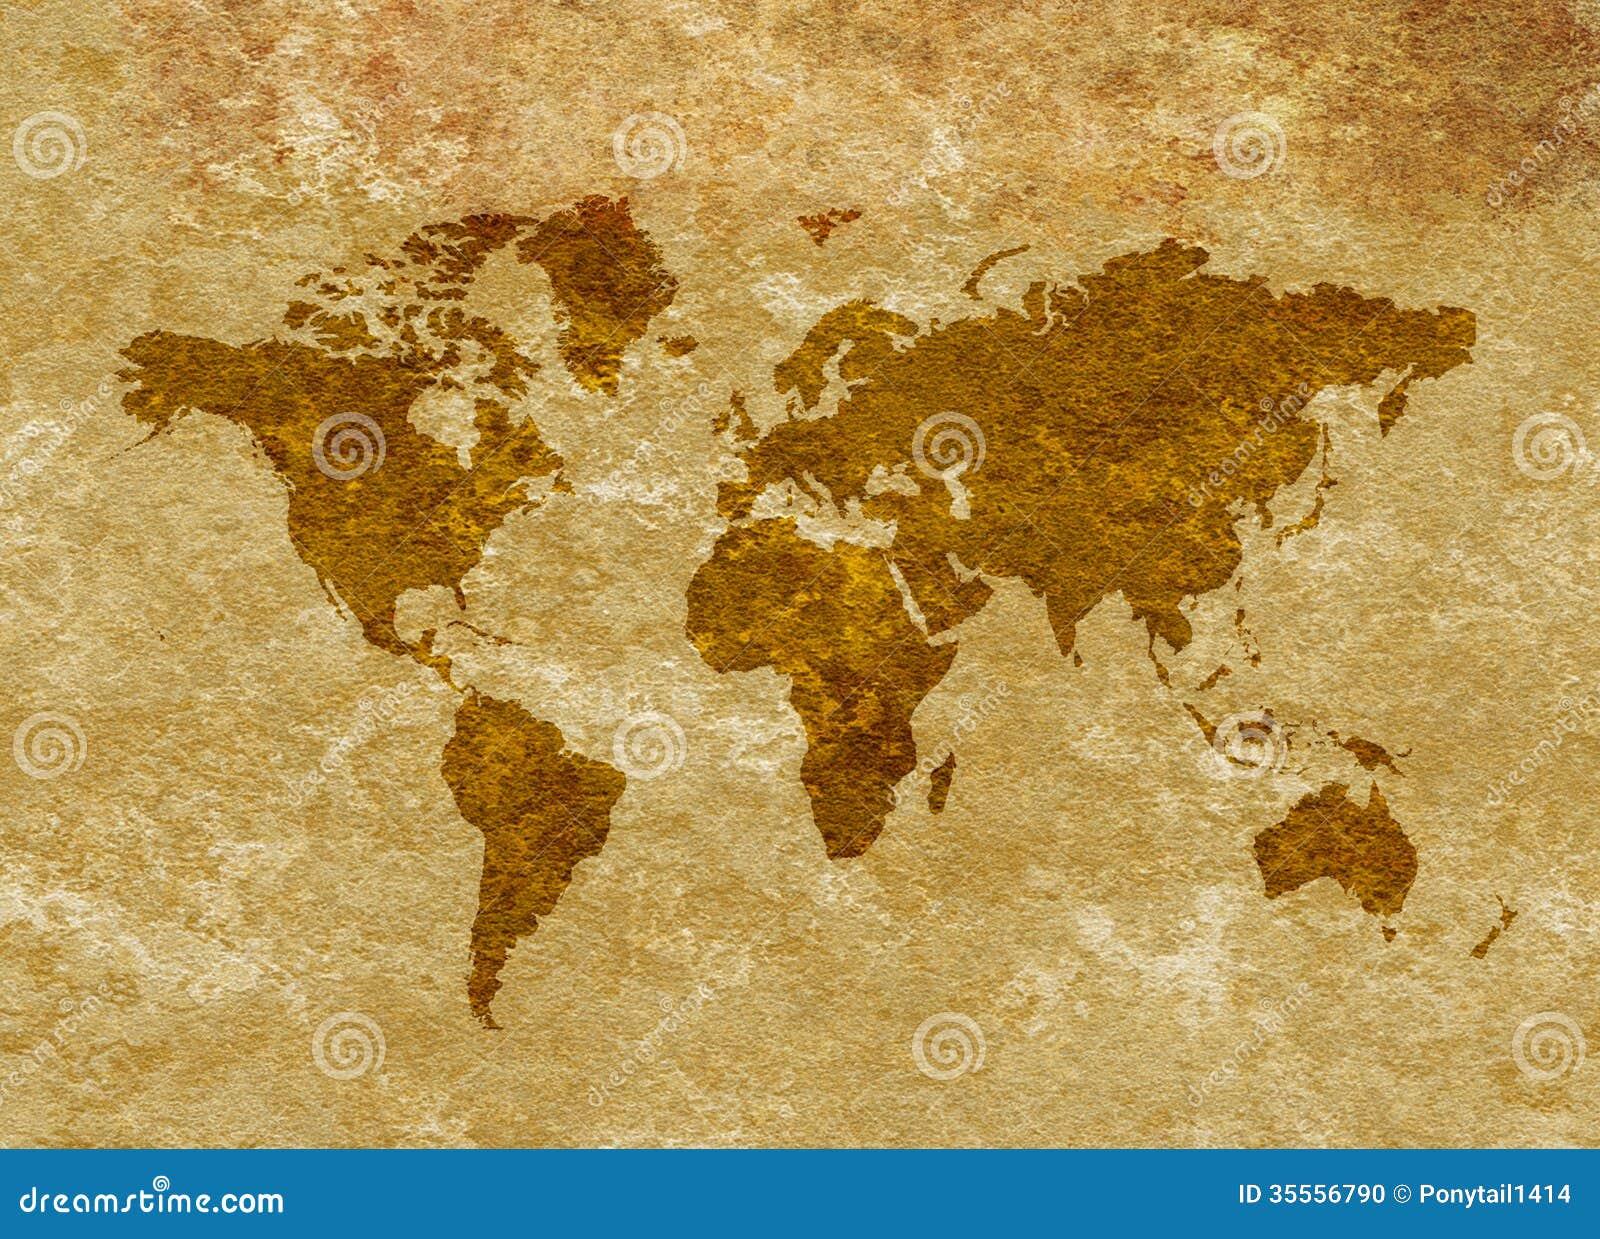 Grunge Antiqued World Map On Parchment Stock Illustration ...